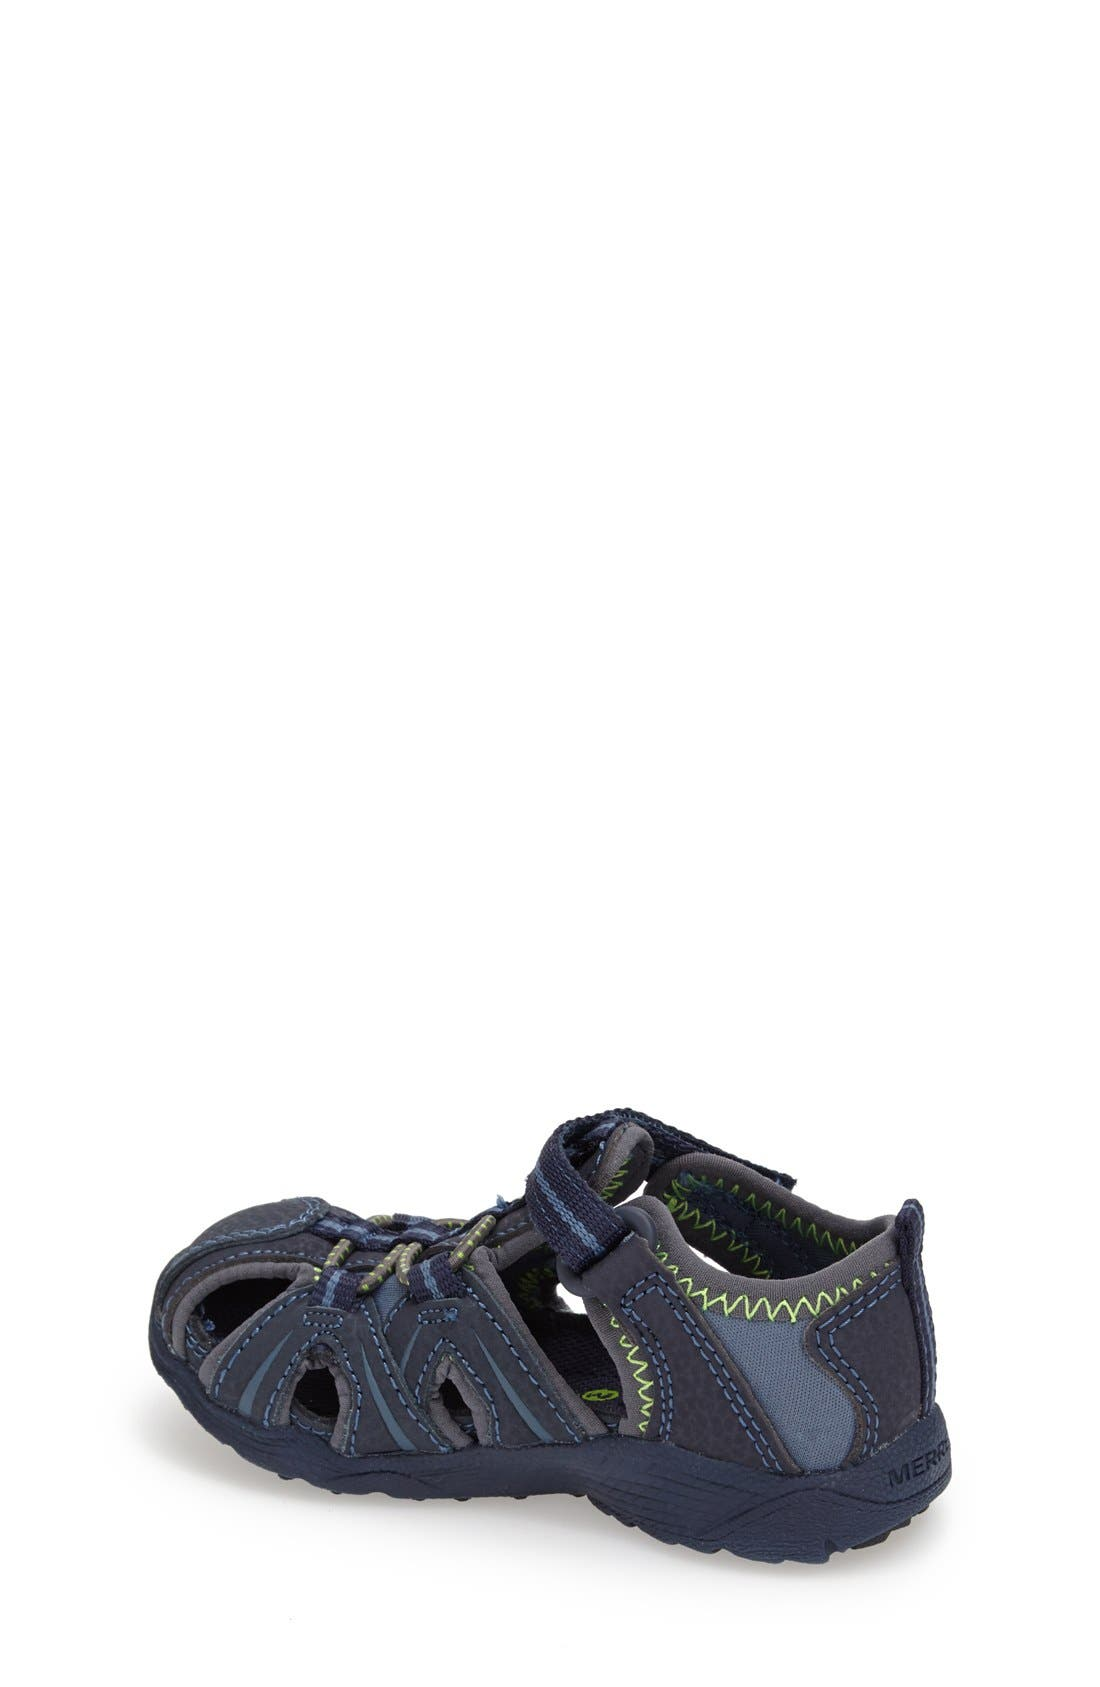 MERRELL, 'Hydro Junior' M-Select Water Sandal, Alternate thumbnail 4, color, NAVY/ GREEN